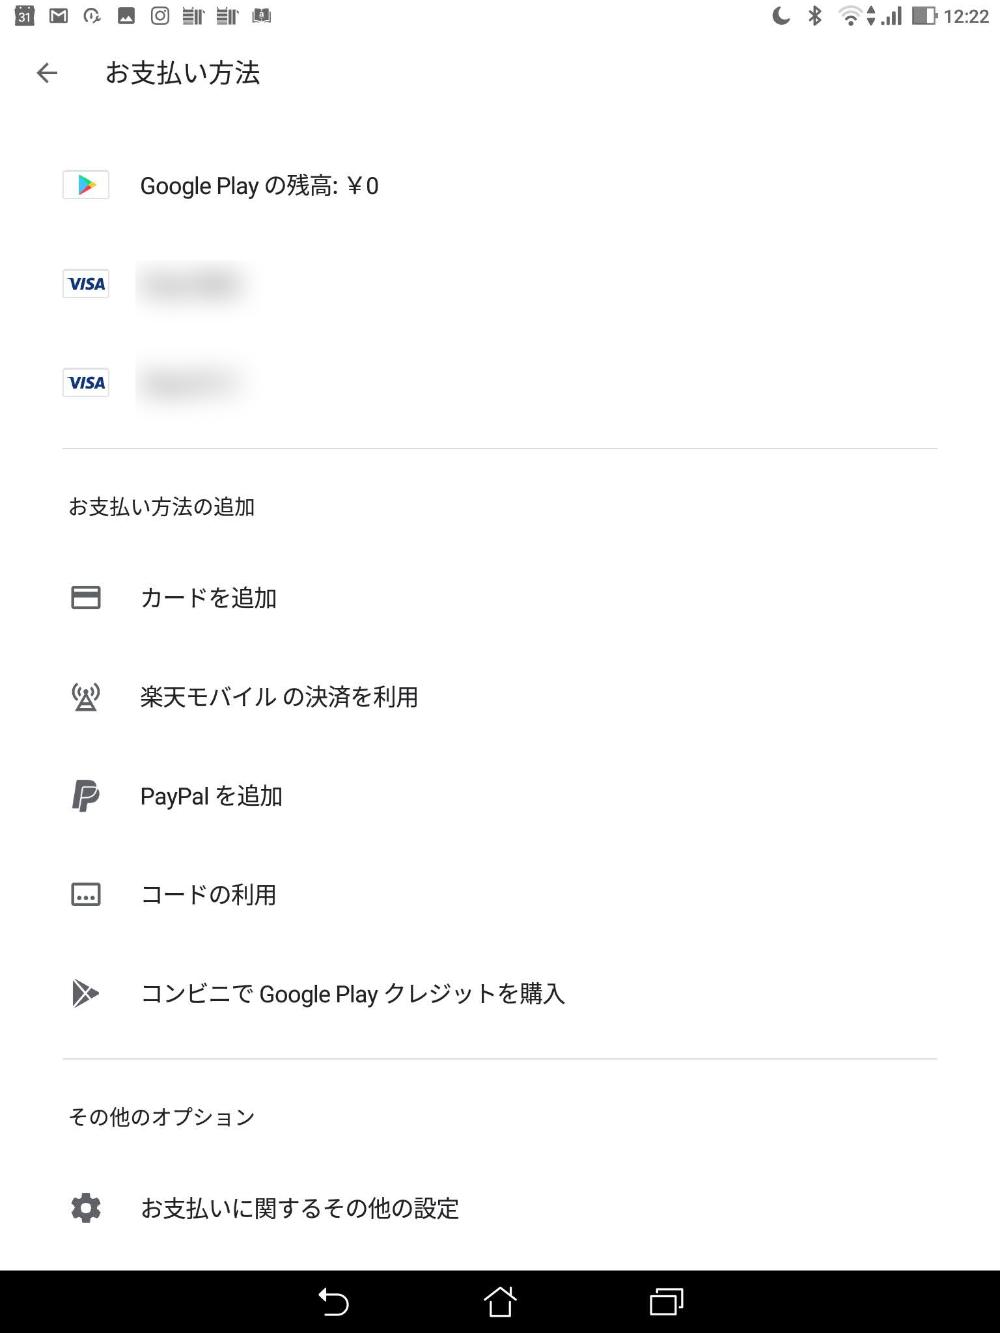 Google Playストア お支払い方法